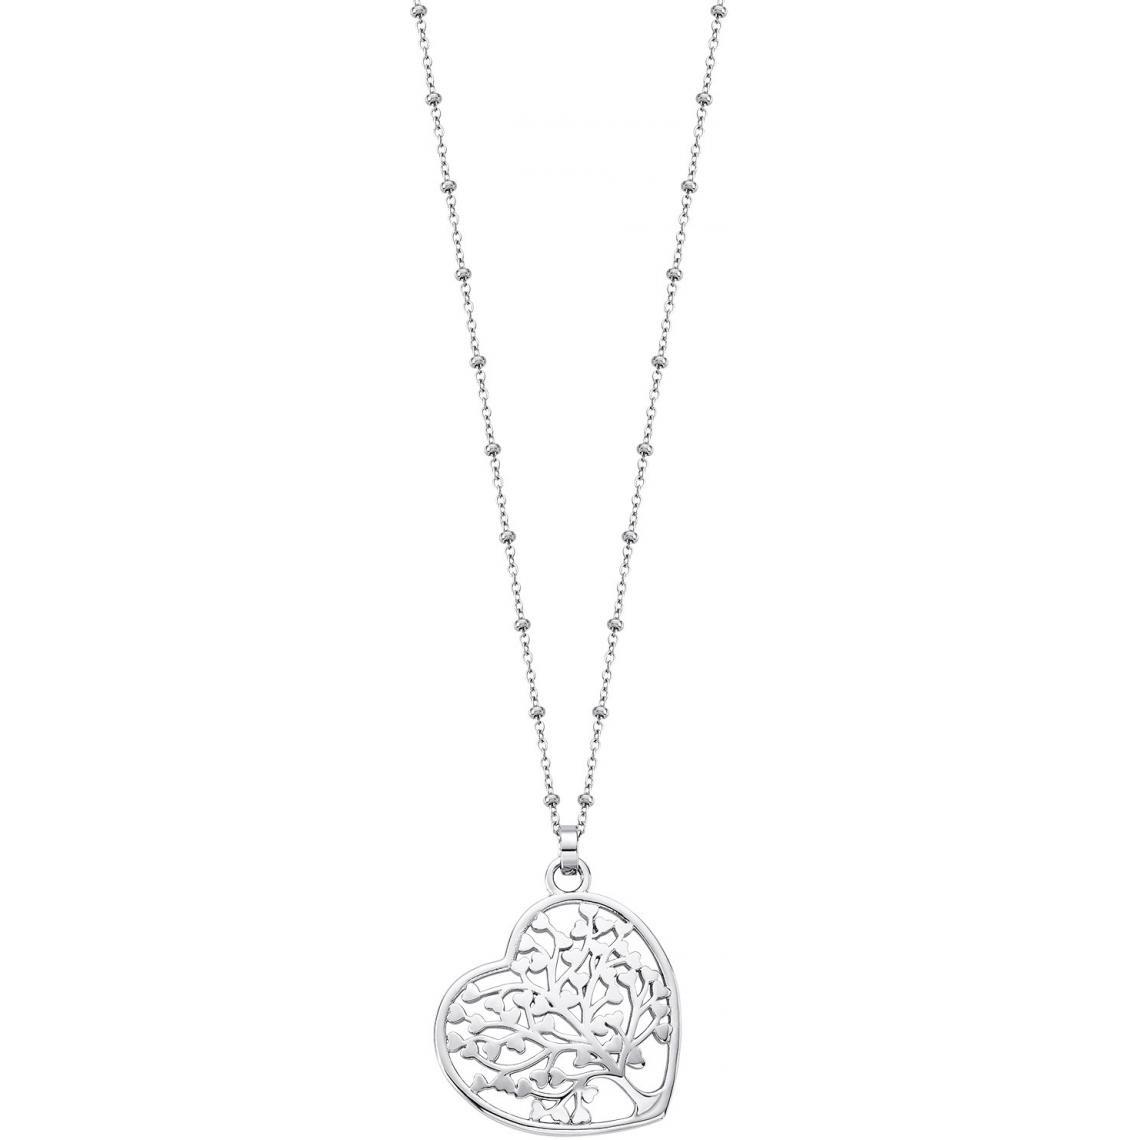 Promo : Collier et pendentif Lotus Silver TREE OF LIFE LP1832-1-1 - Collier et pendentif TREE OF LIFE ArgentLotus Silver